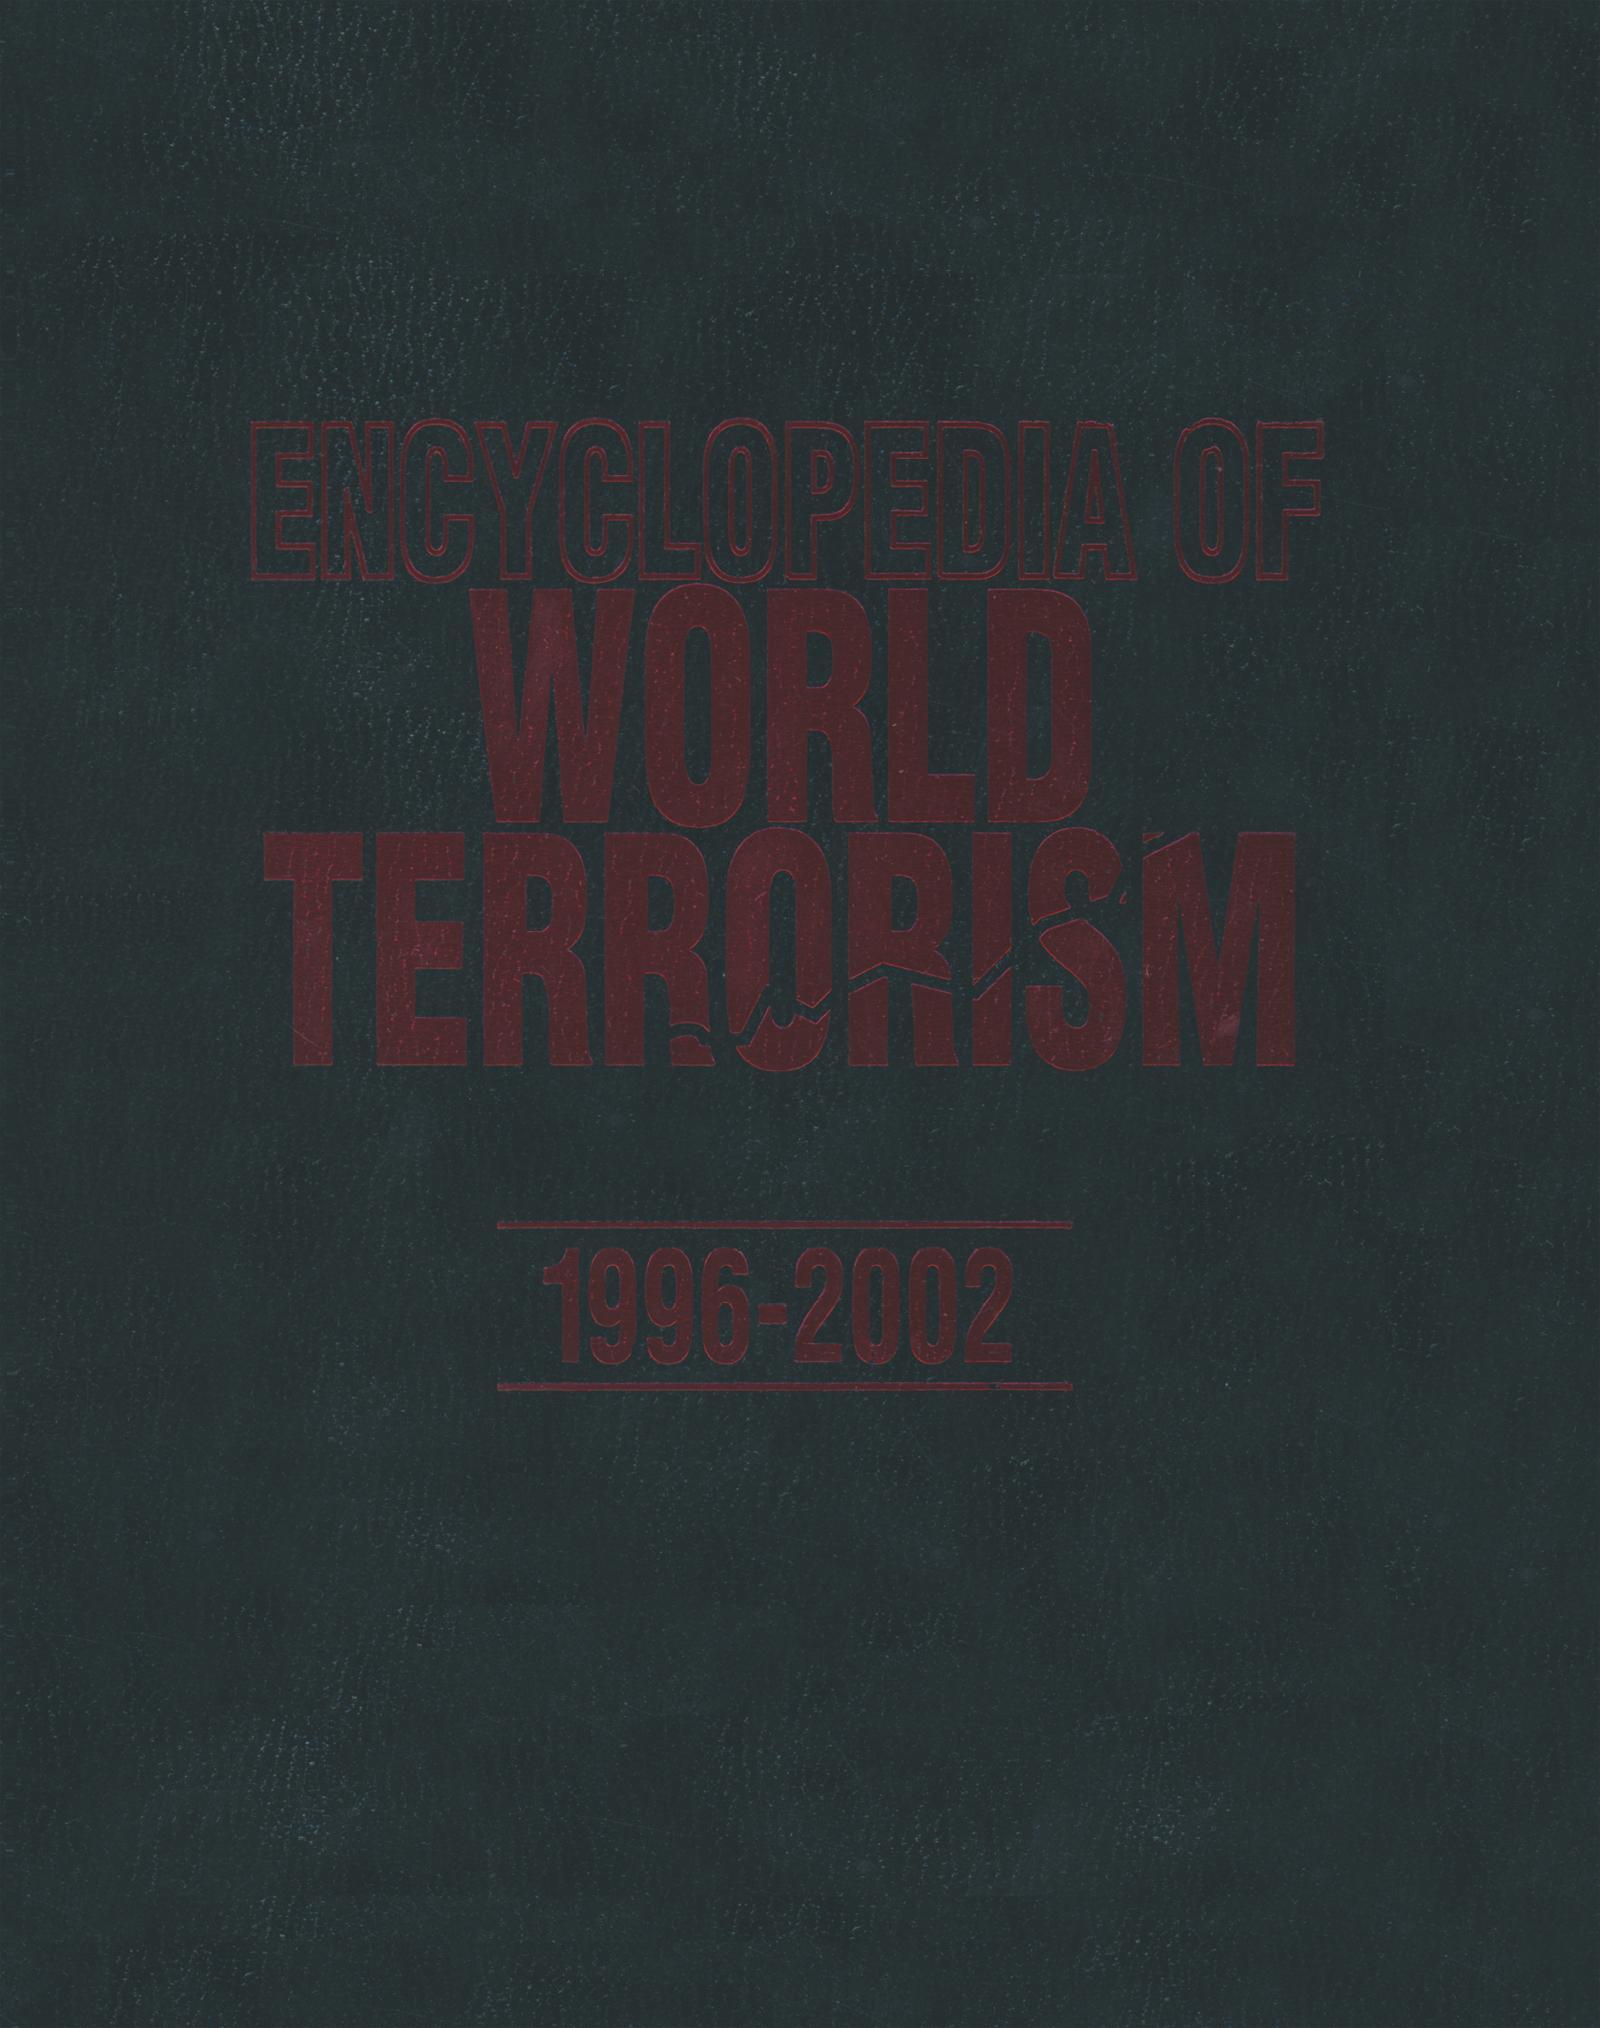 Encyclopedia of World Terrorism: 1996-2002